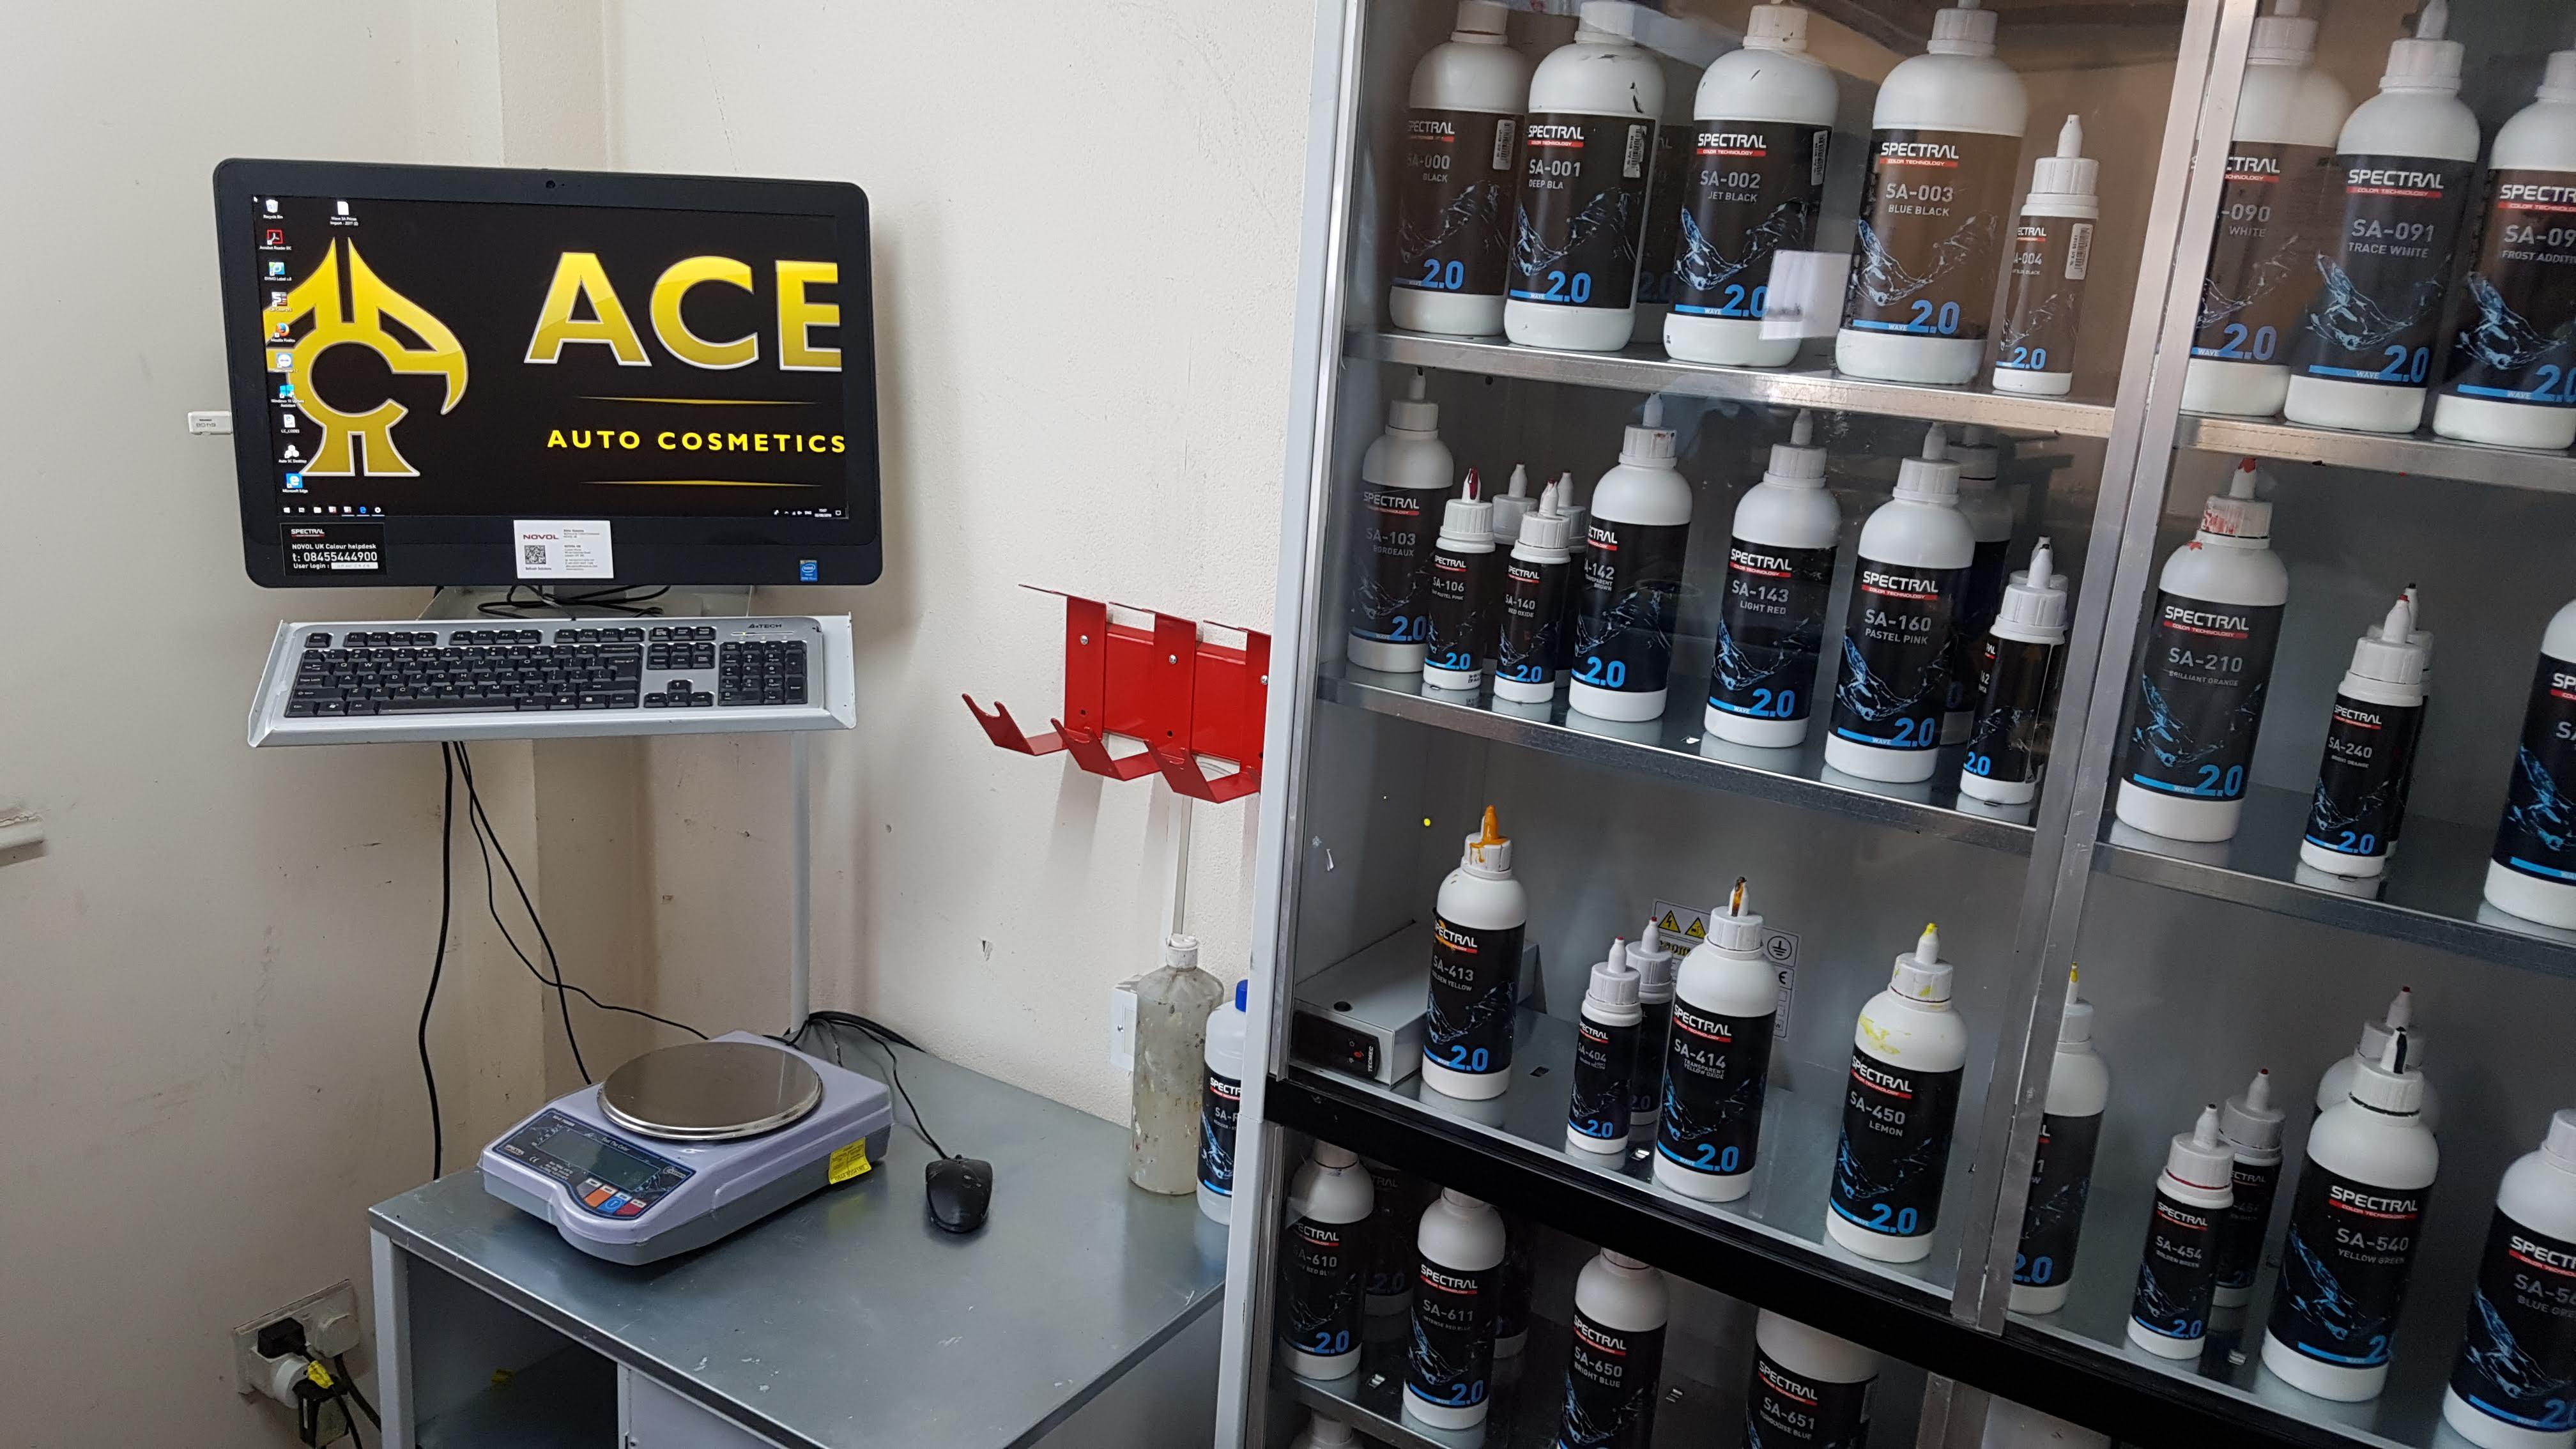 Ace Auto Cosmetics paint room